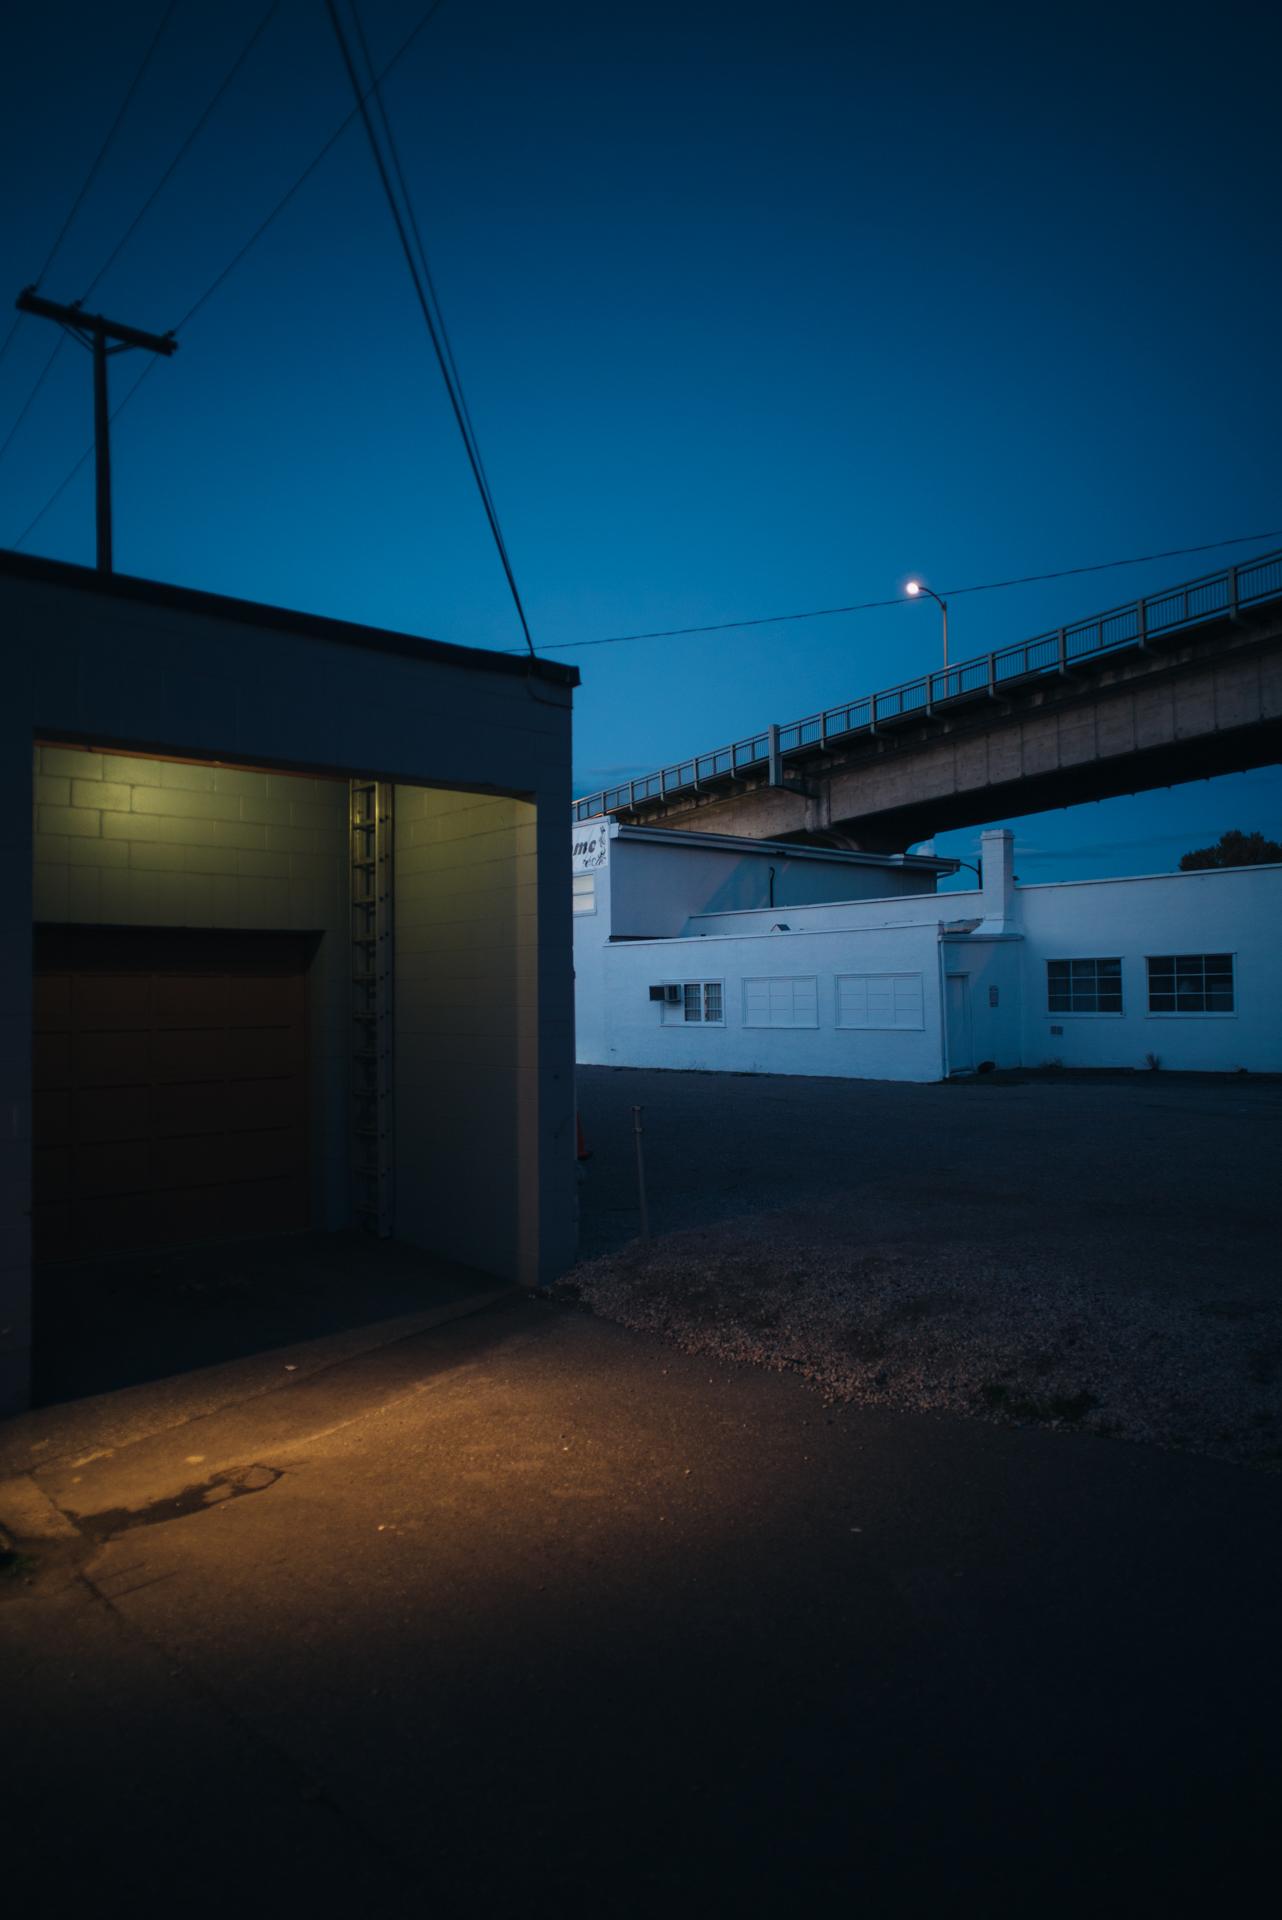 spaces+light-4.jpg